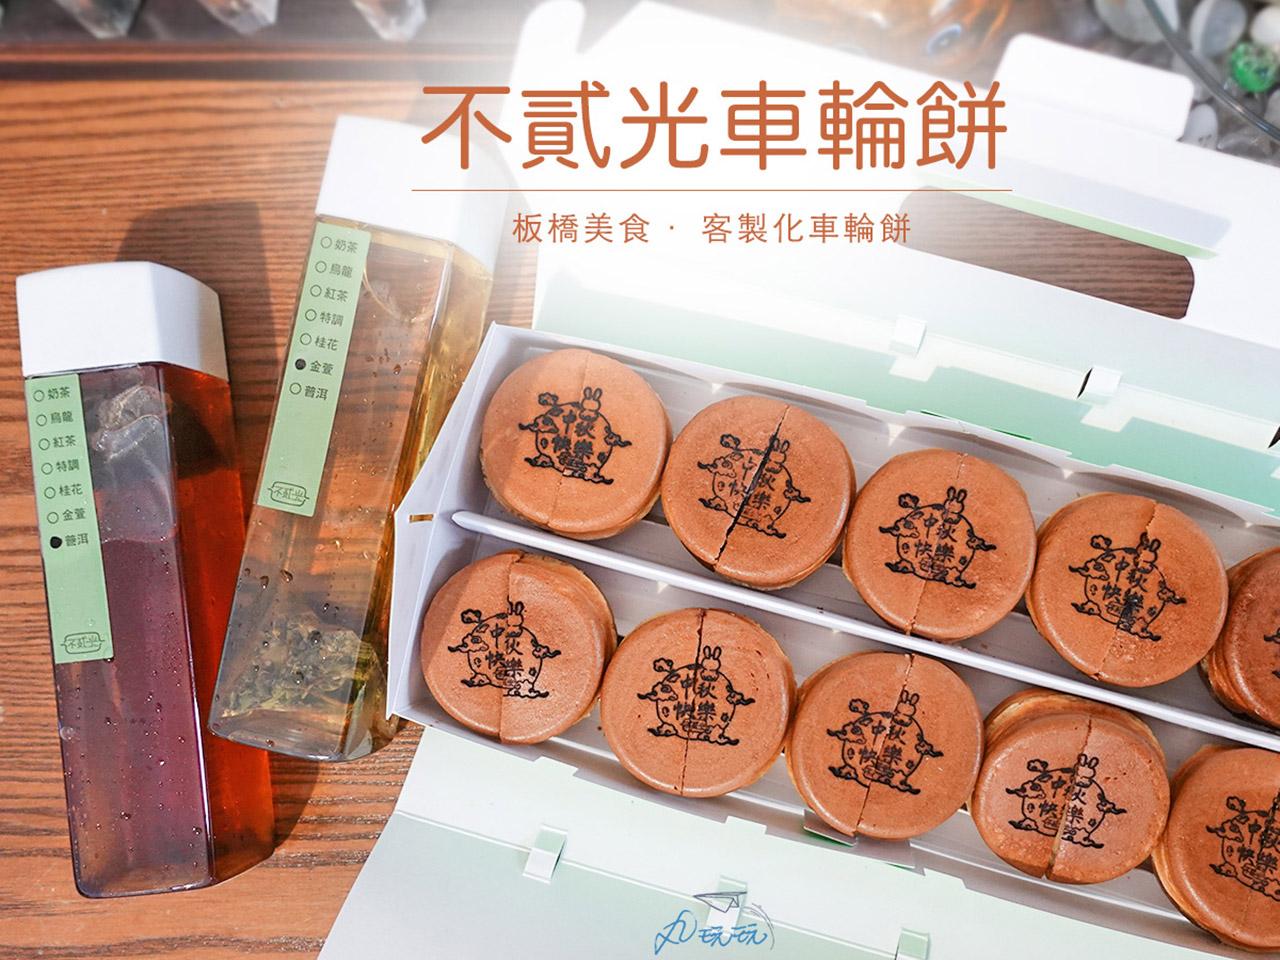 You are currently viewing 板橋小吃|不貳光車輪餅 客製化烙印,上班族最愛的下午茶點心